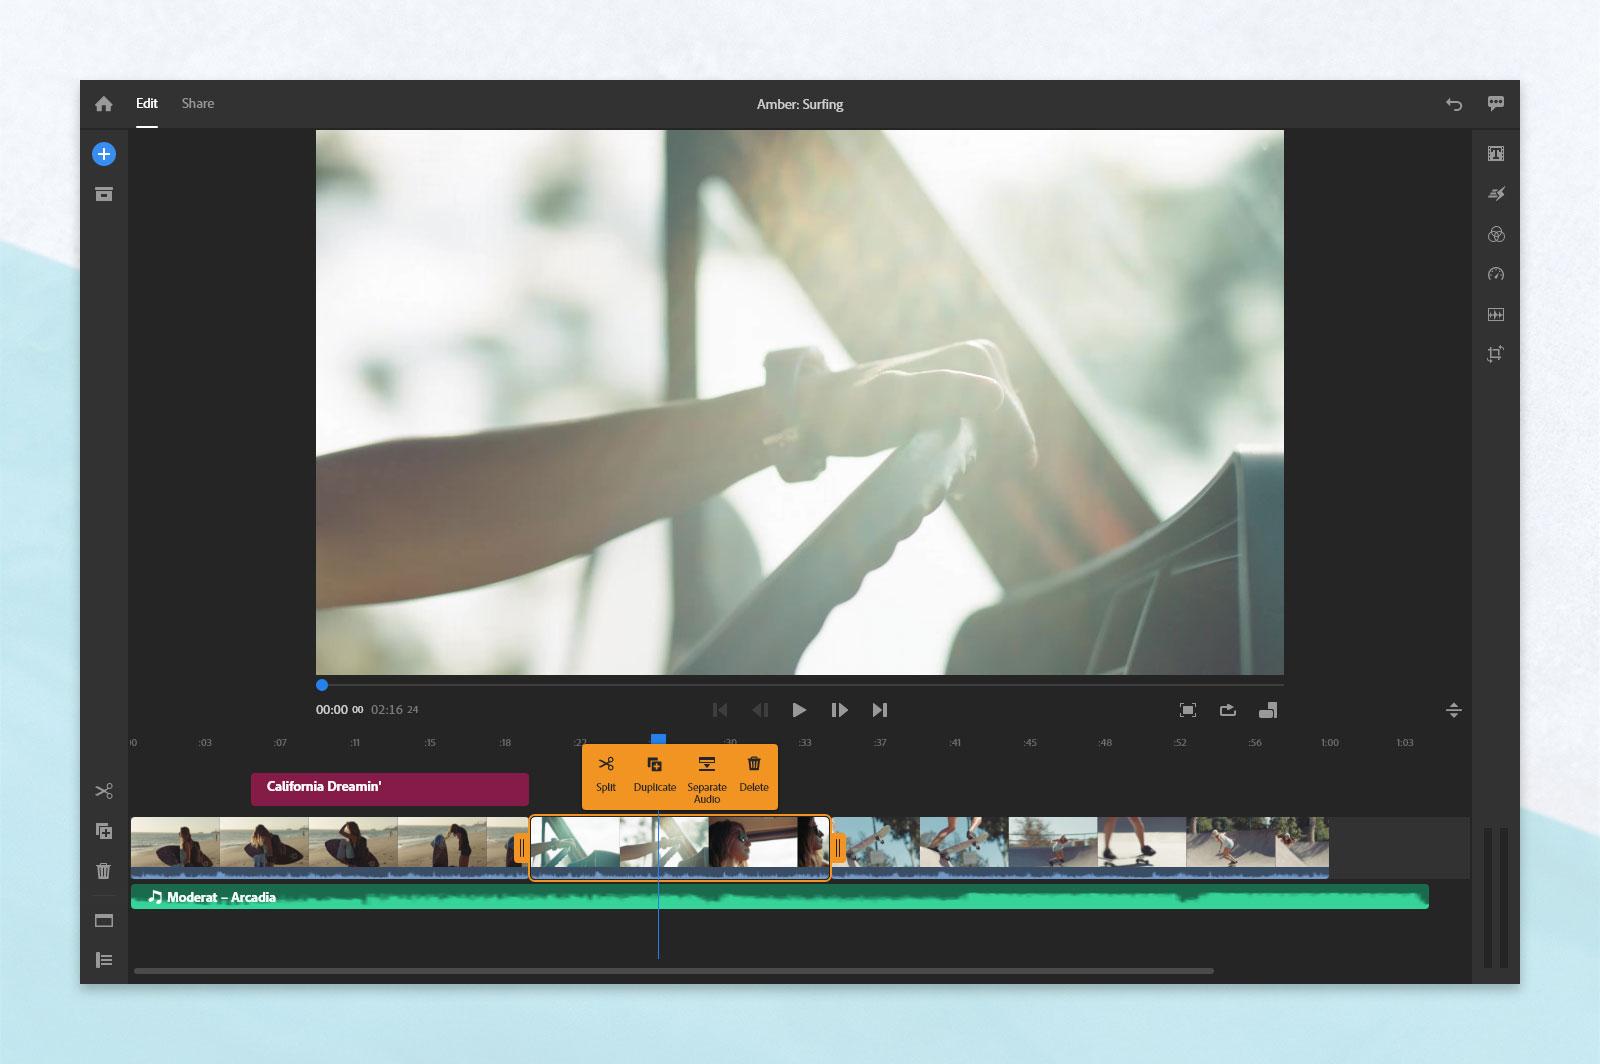 Adobe - new April updates for Premiere Pro and Premiere Rush